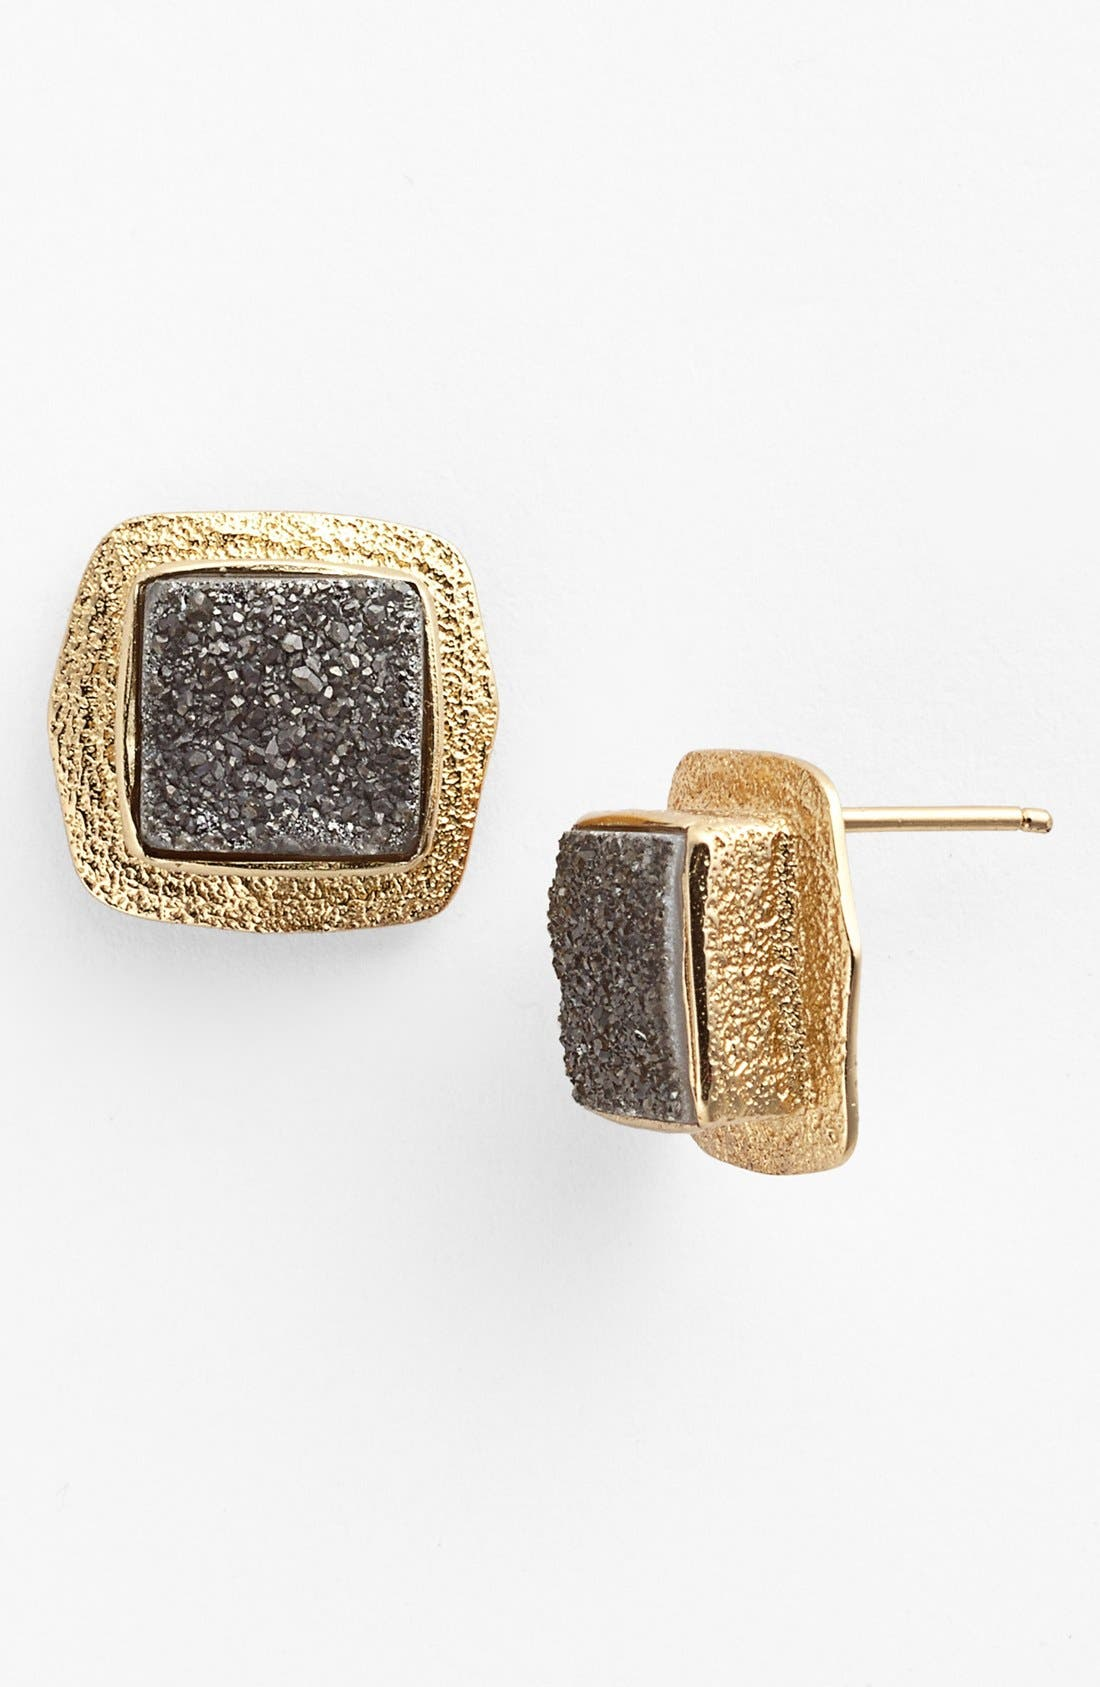 Alternate Image 1 Selected - Melinda Maria 'Jordan' Drusy Stud Earrings